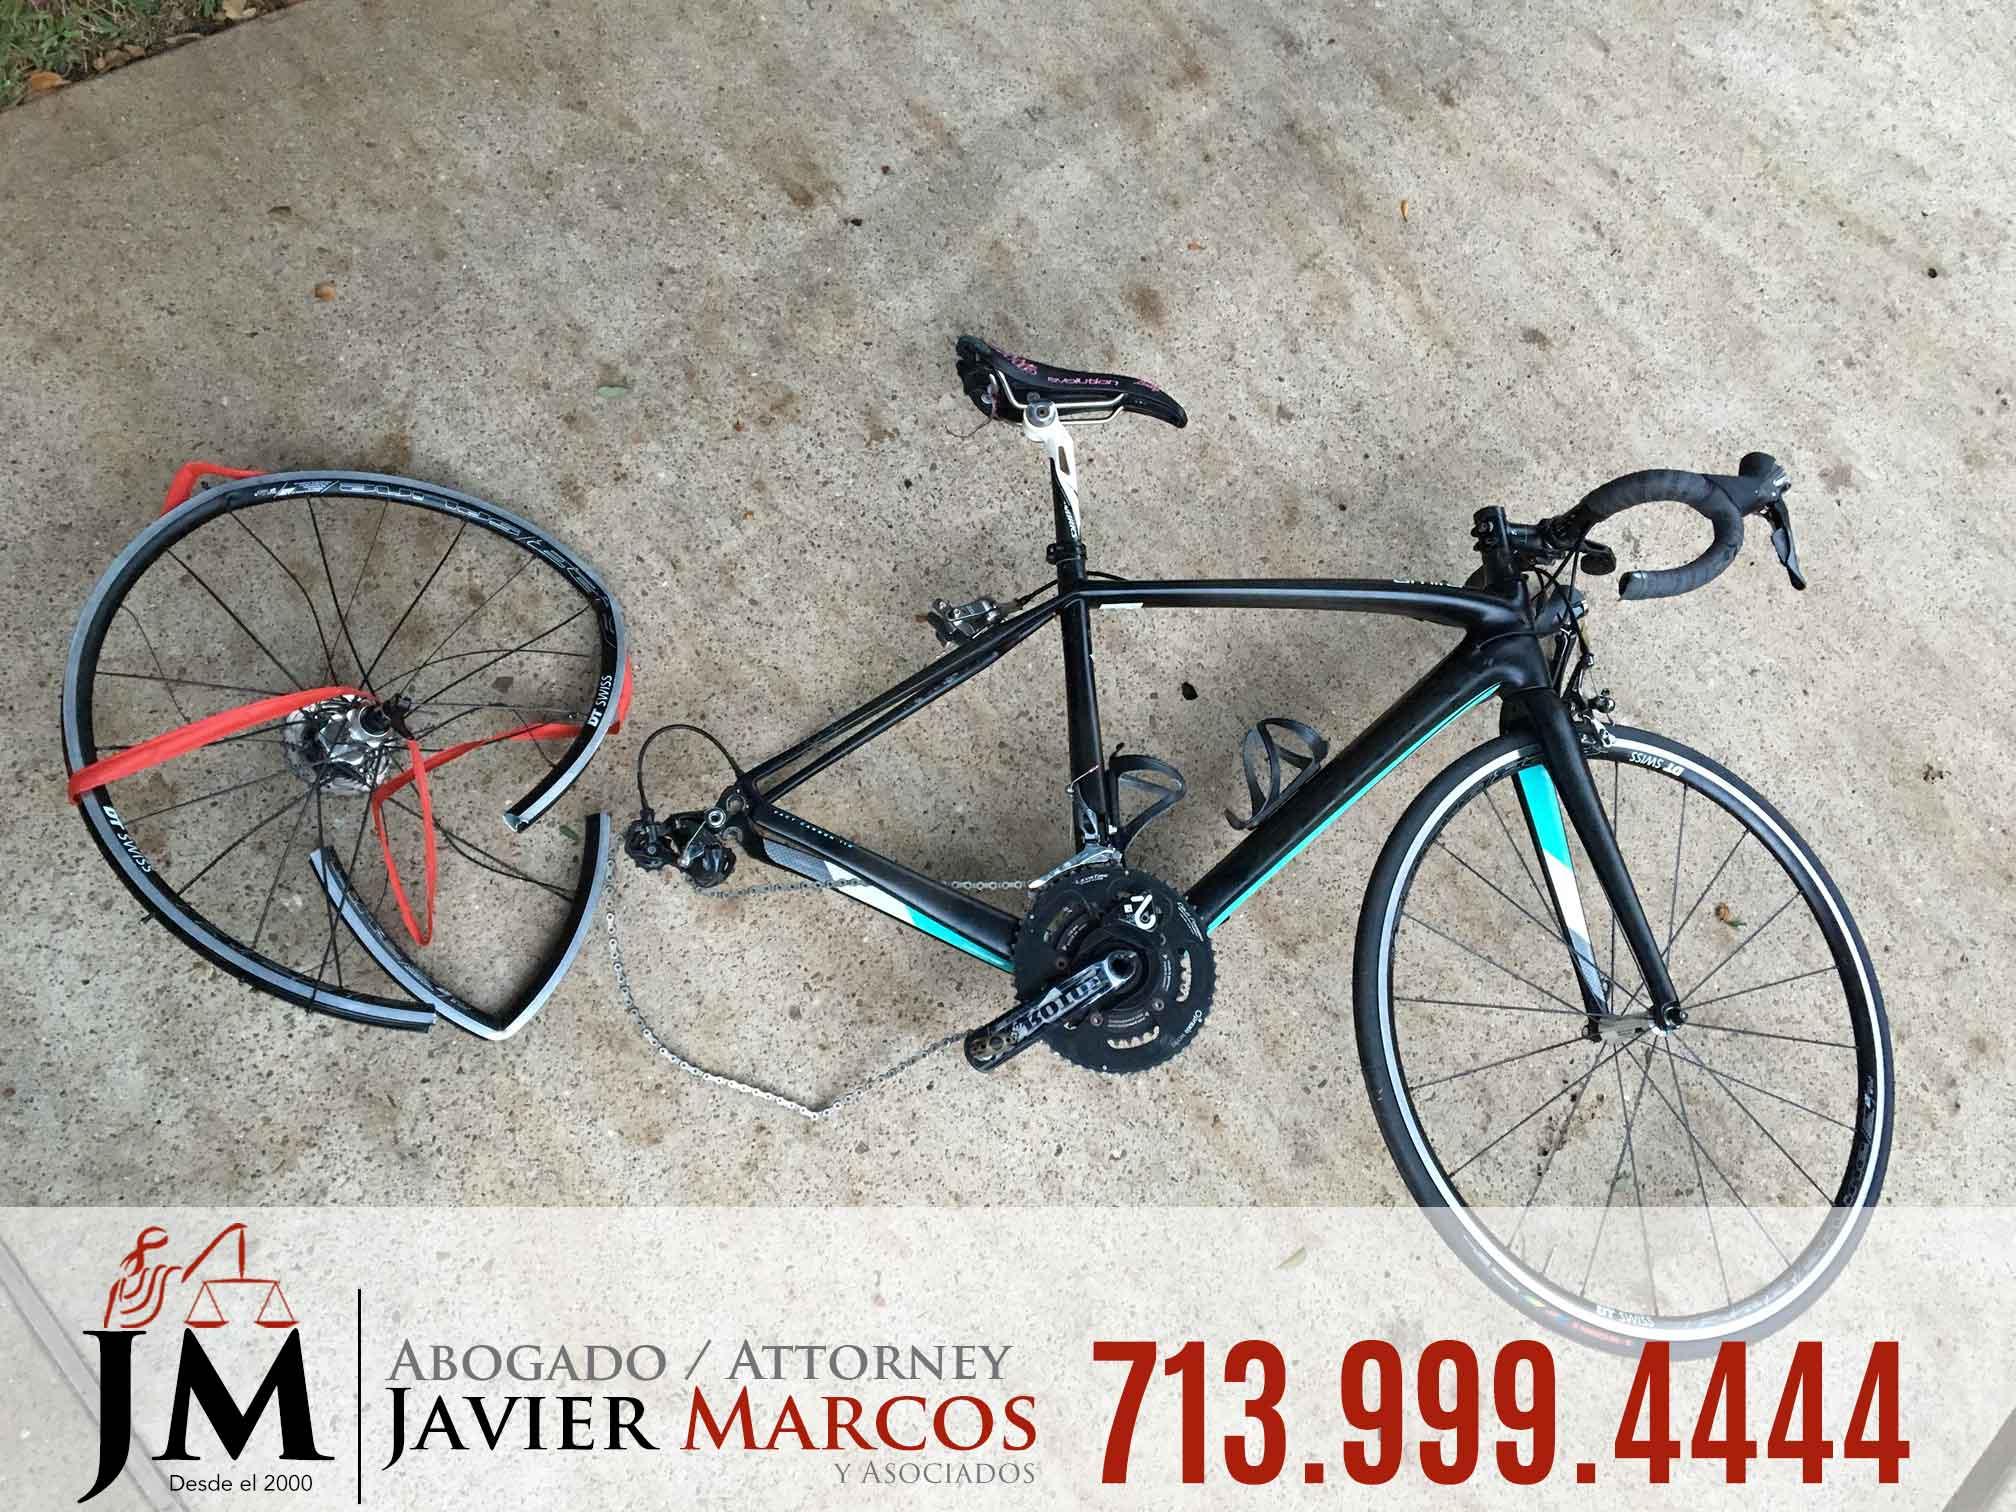 Abogado de Accidente de Bicicleta | Abogado Javier Marcos | 713.999.4444